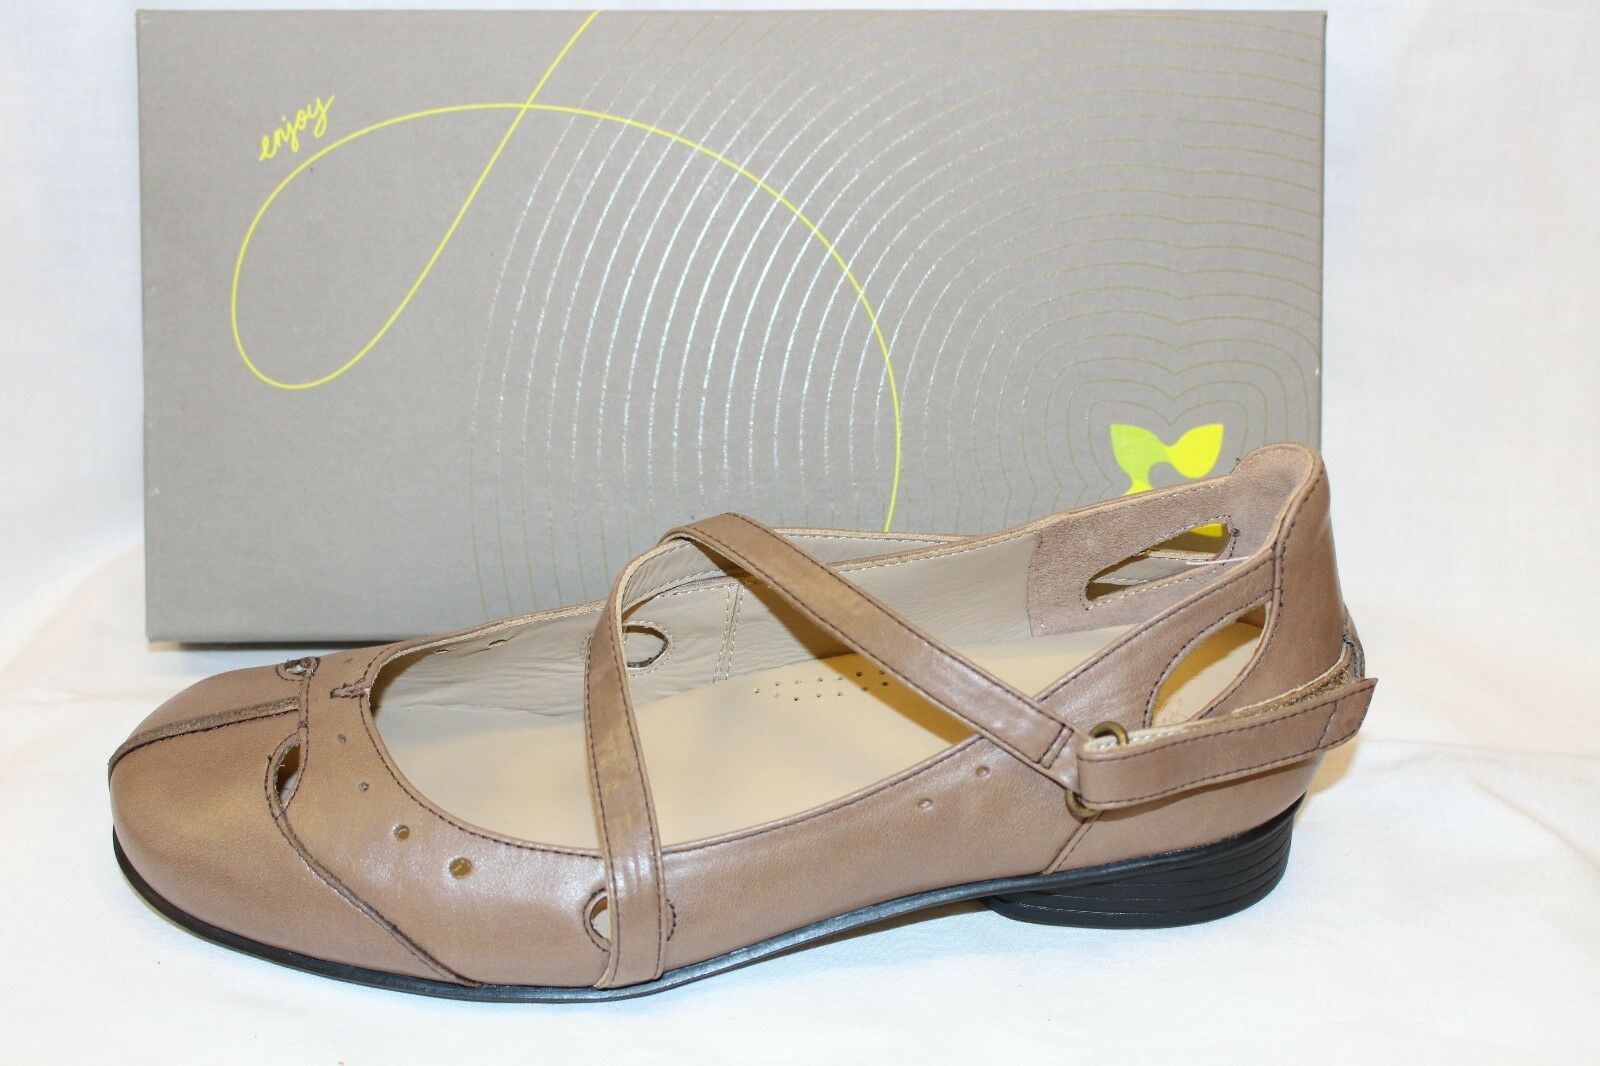 LADIES SHOES/FOOTWEAR -Ziera Ghost chestnut size 37/6